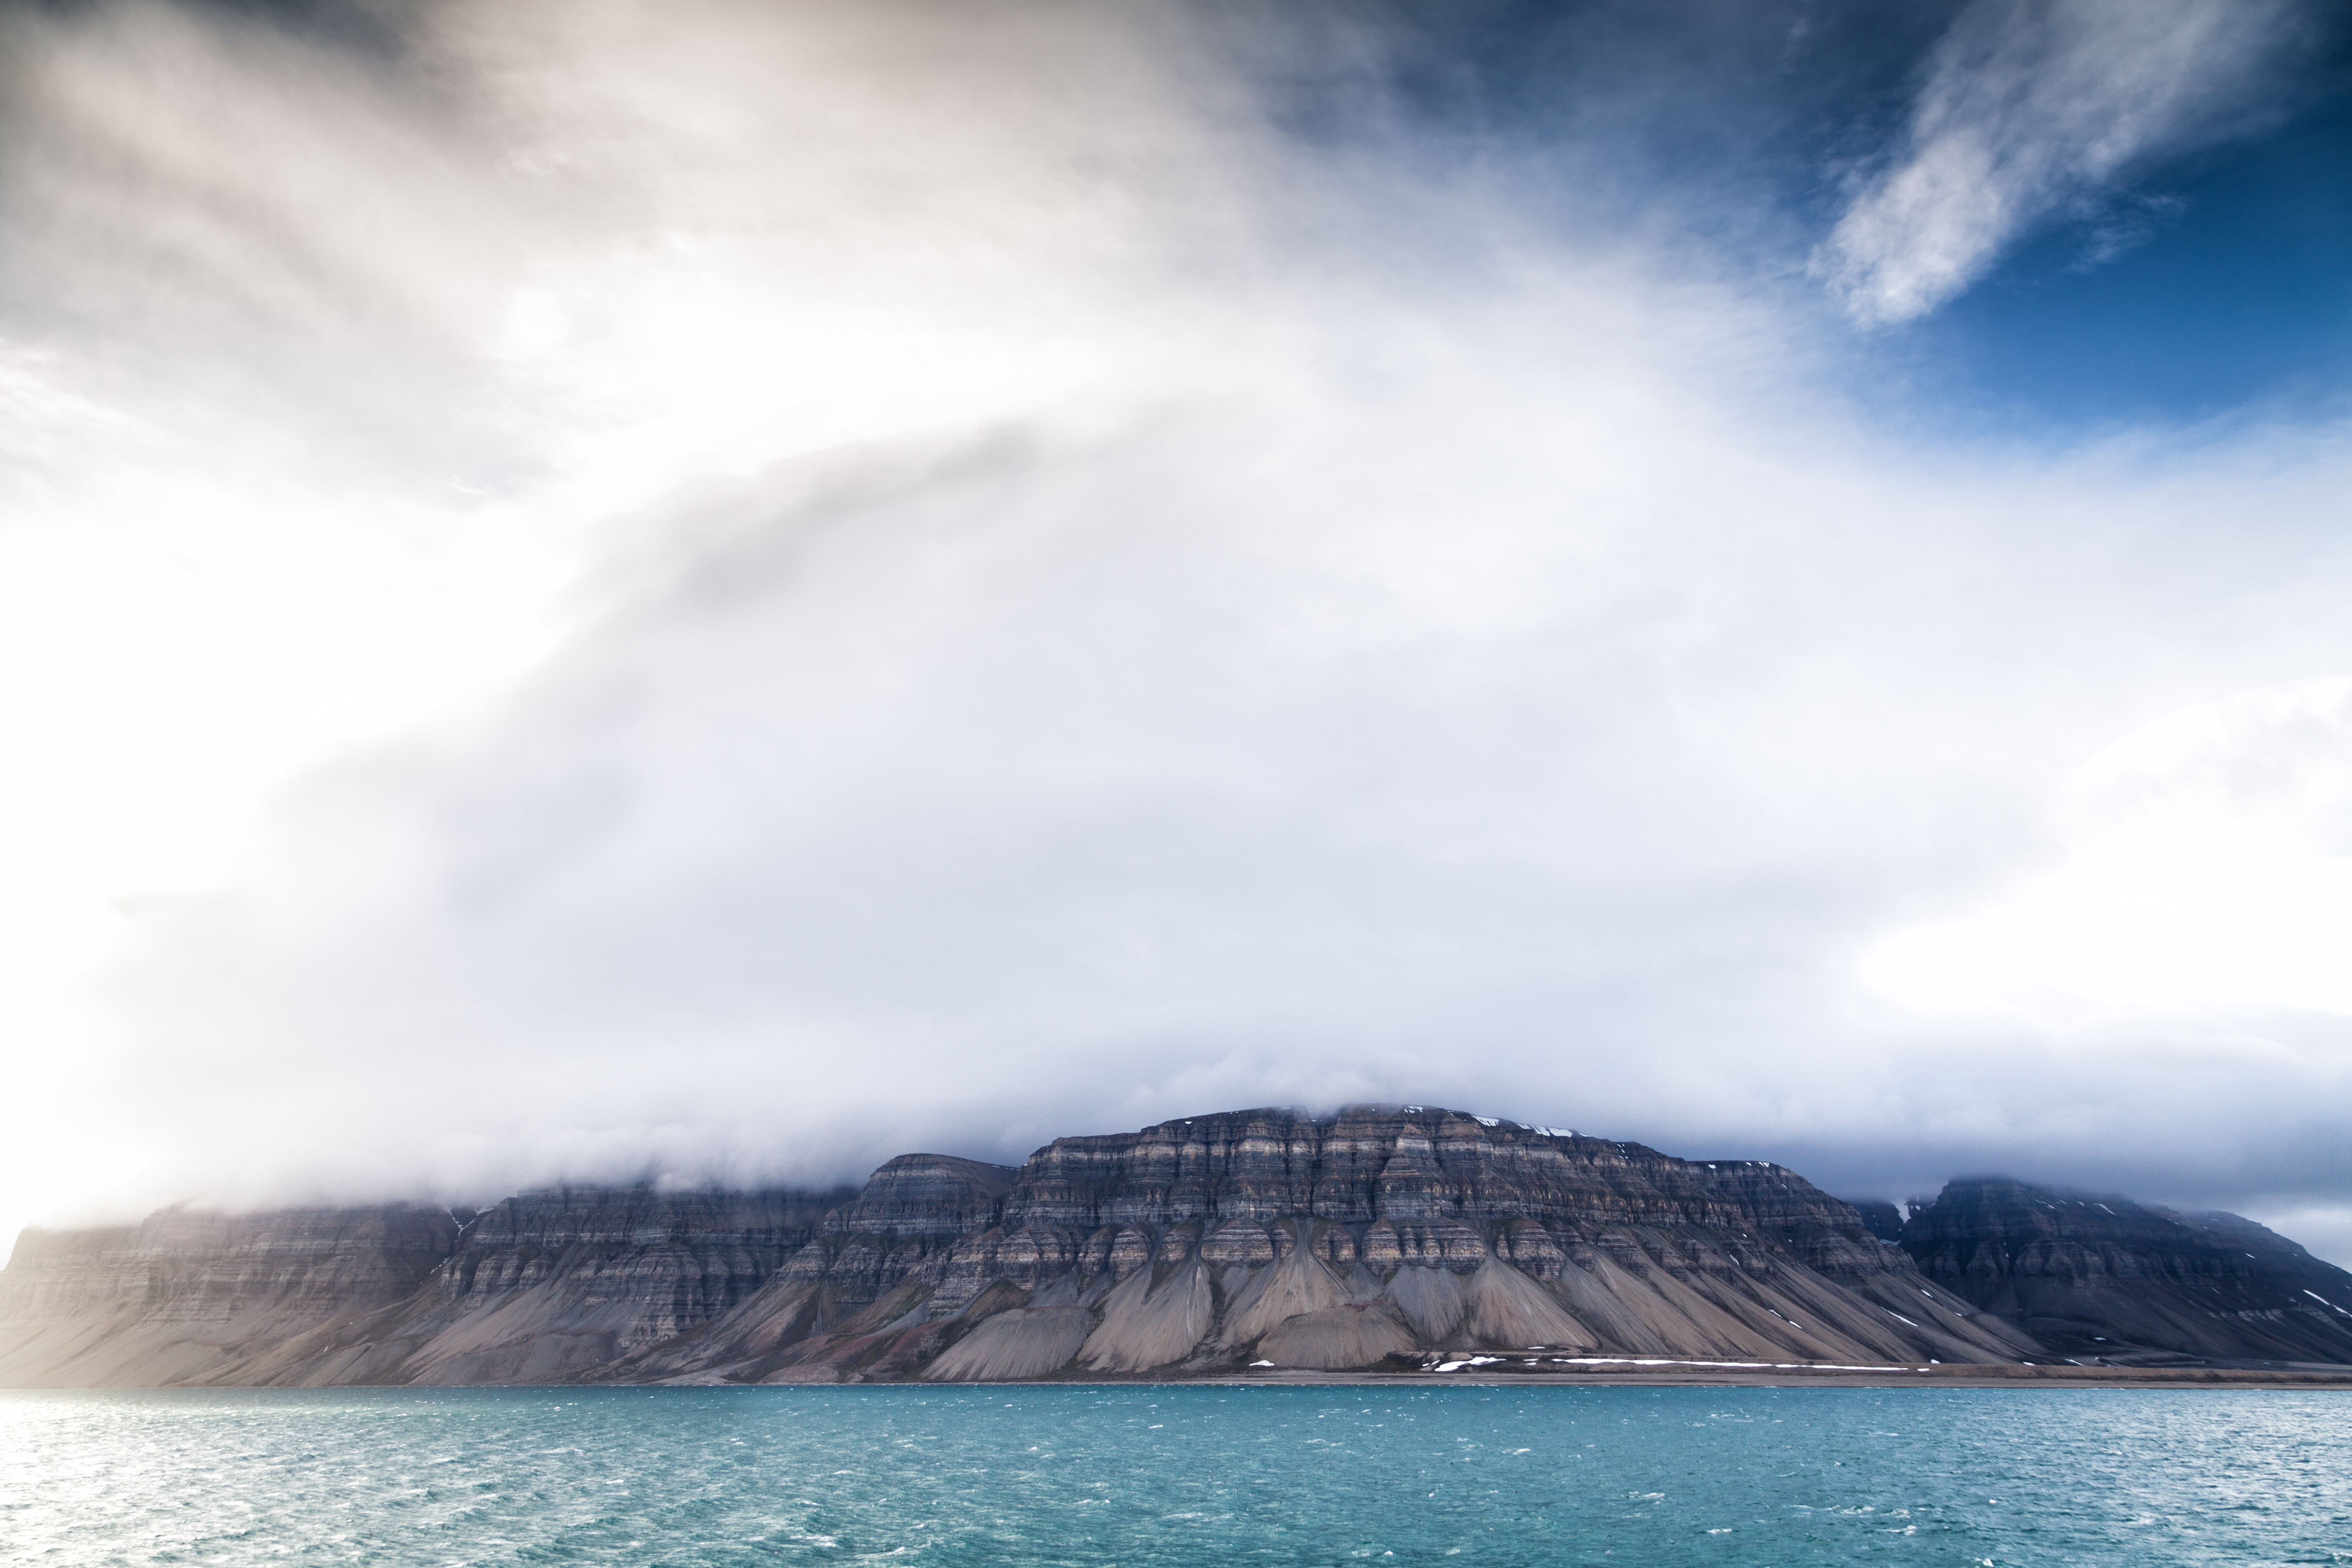 Svalbard-Longyearbyen I